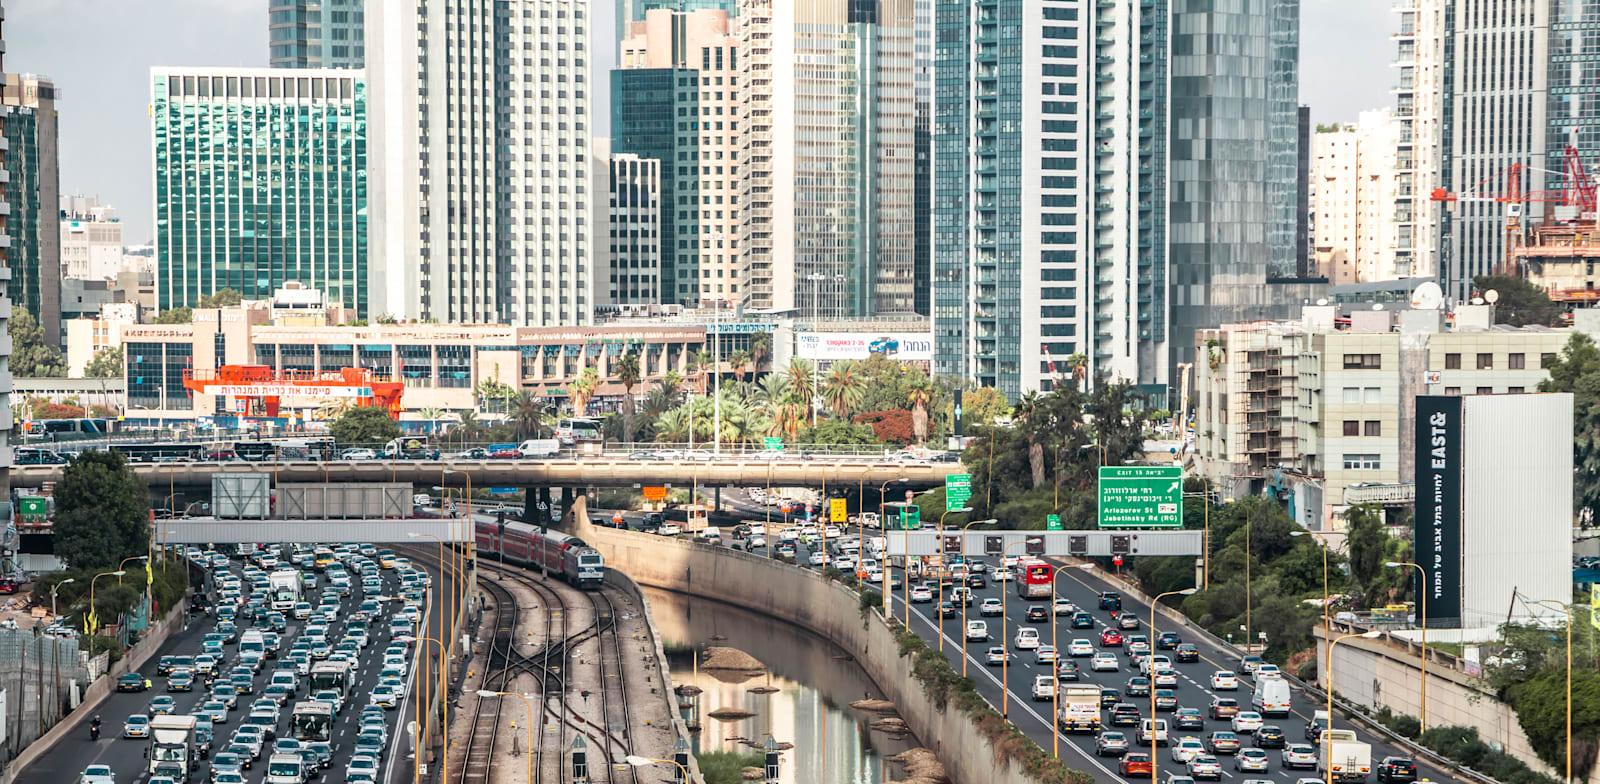 Tel Aviv traffic Photo: Shutterstock